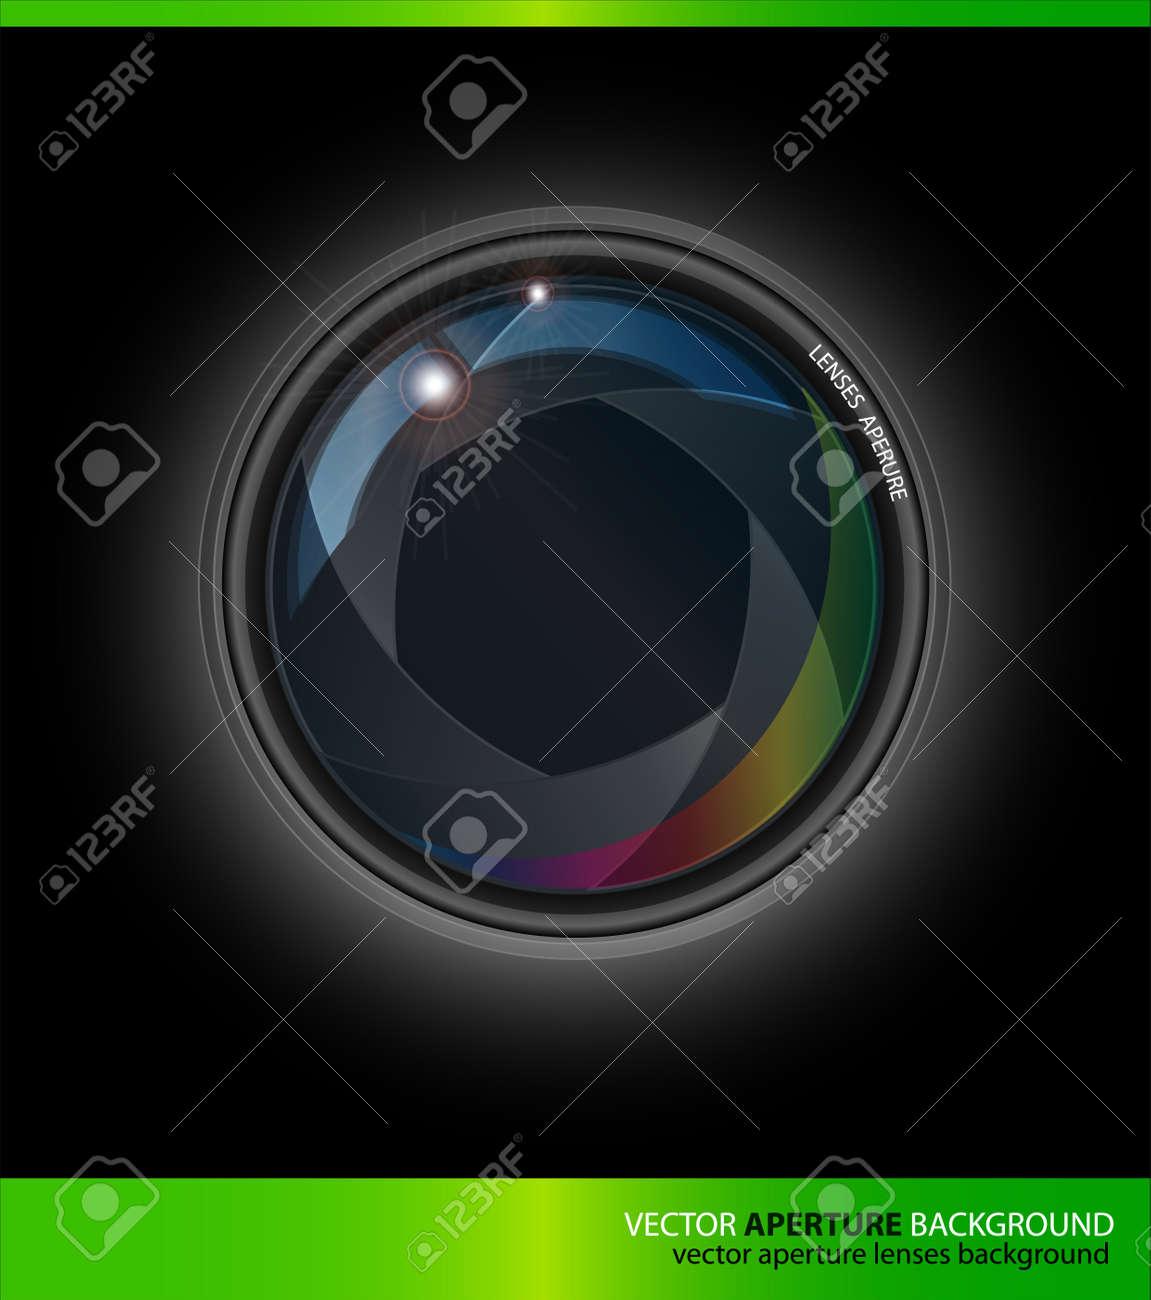 Vector Lenses Aperture on a Black Background Stock Vector - 10540415